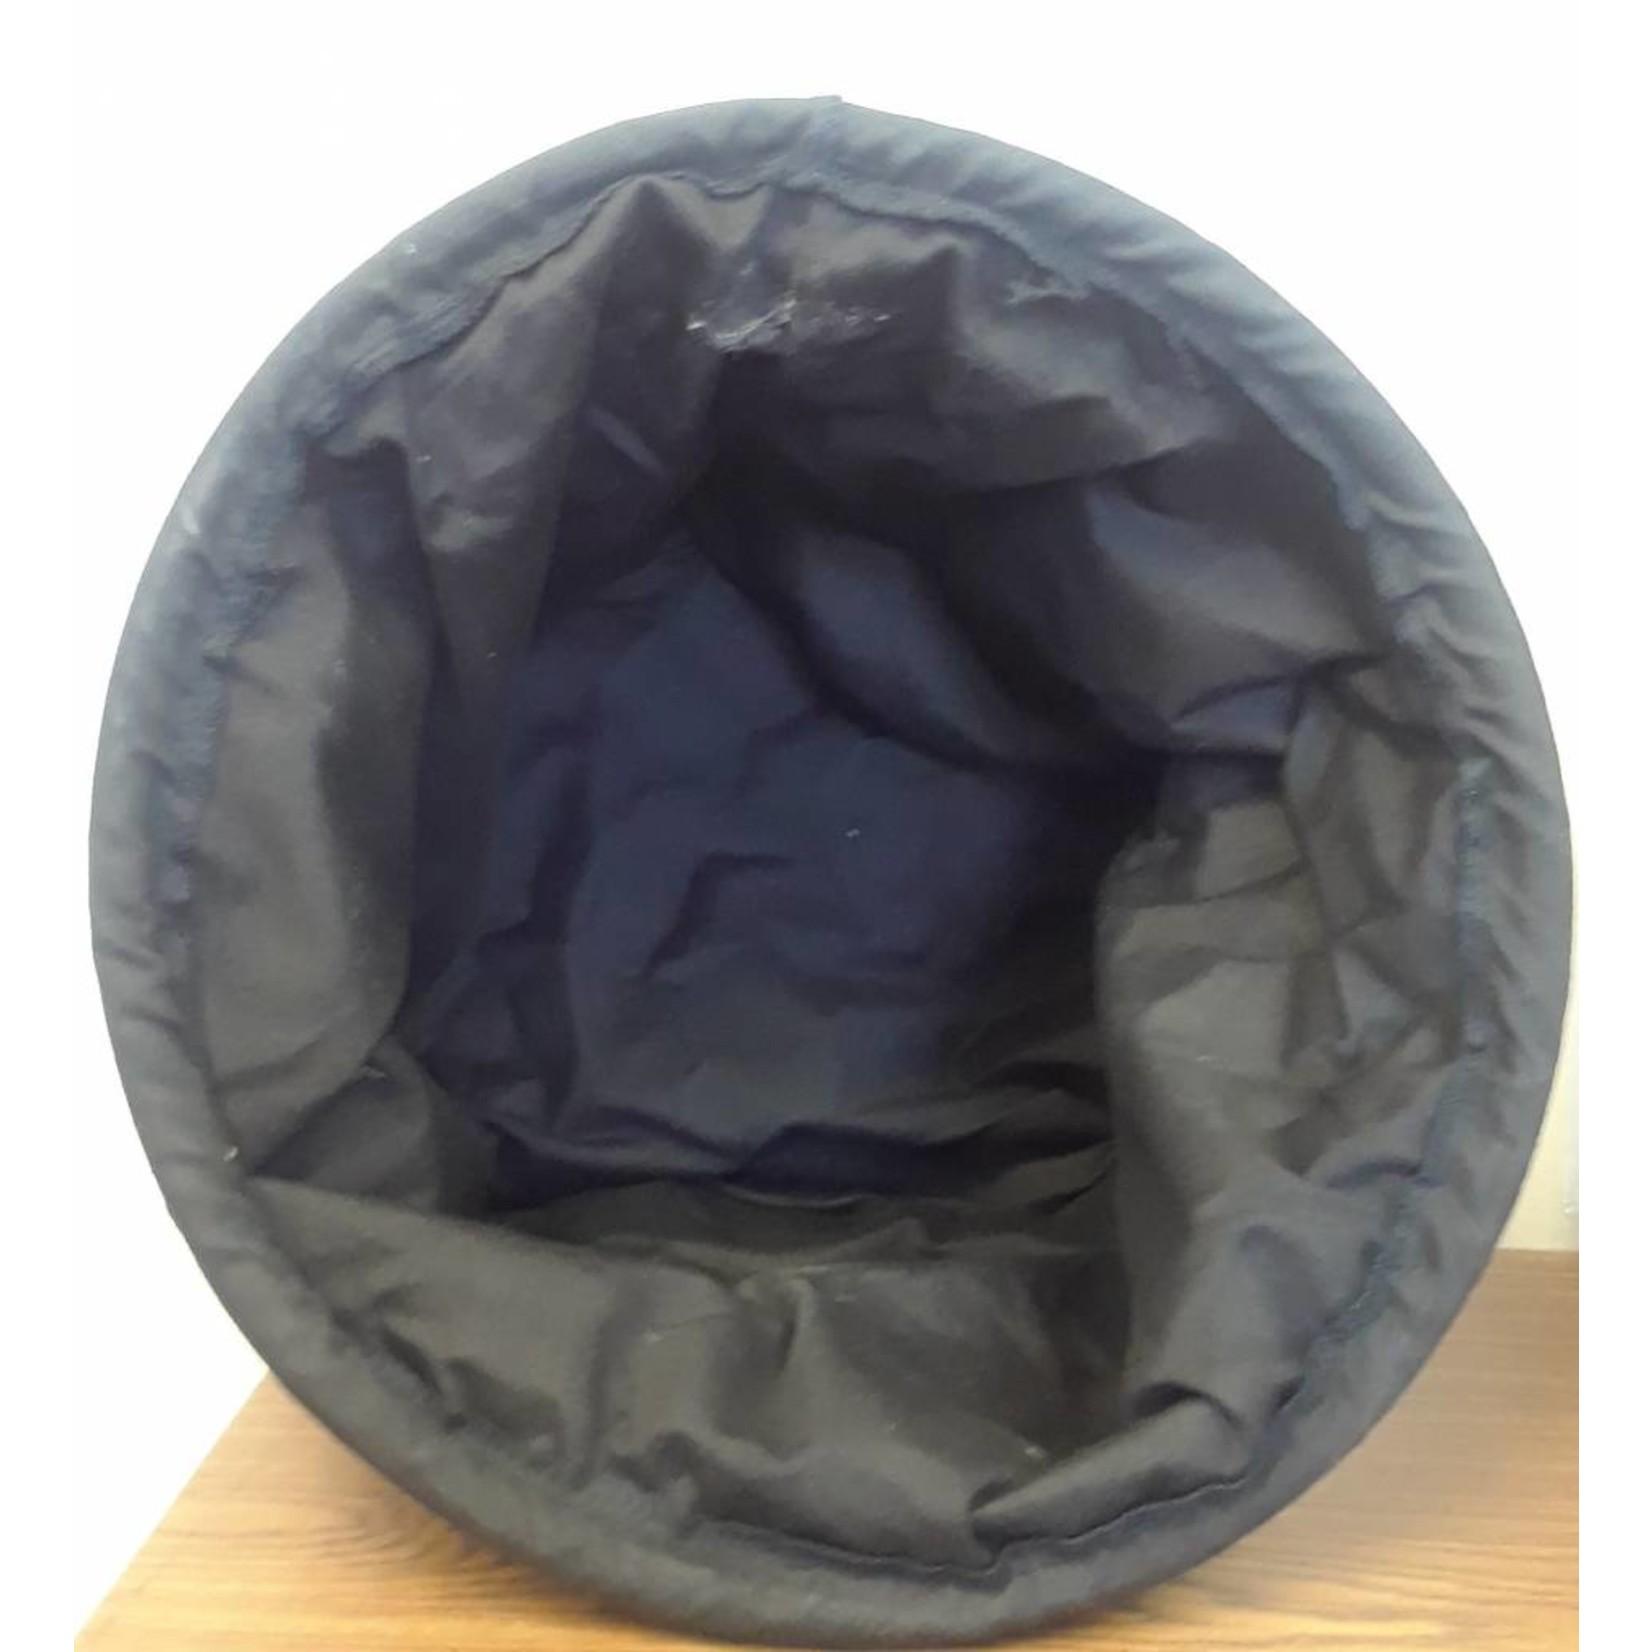 Brute Centreal Vacuum Cloth Vacuum Filter - Fits Brute